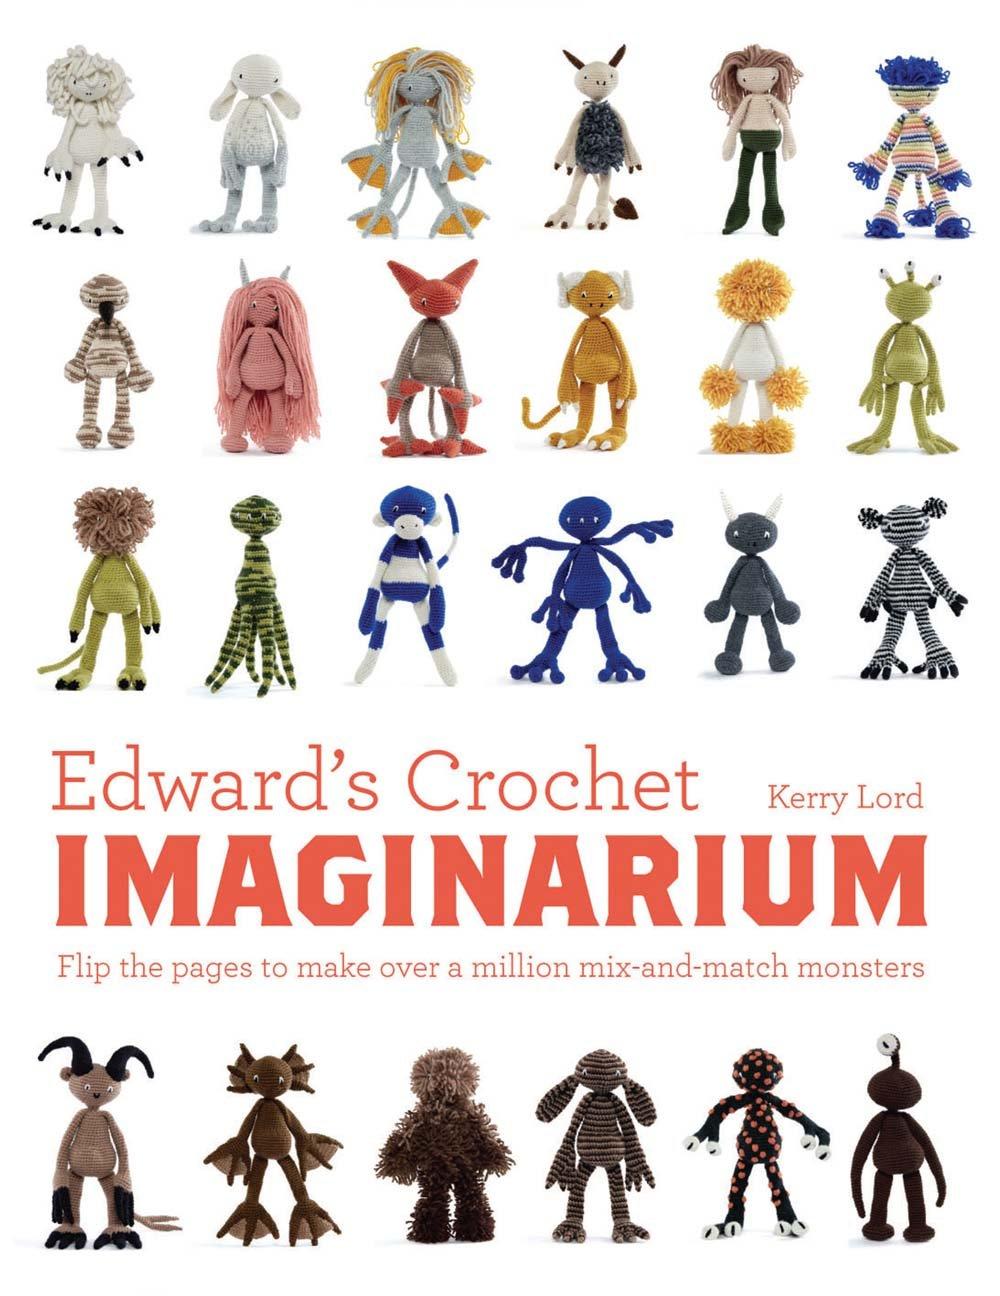 Edwards Crochet Imaginarium Mix Match